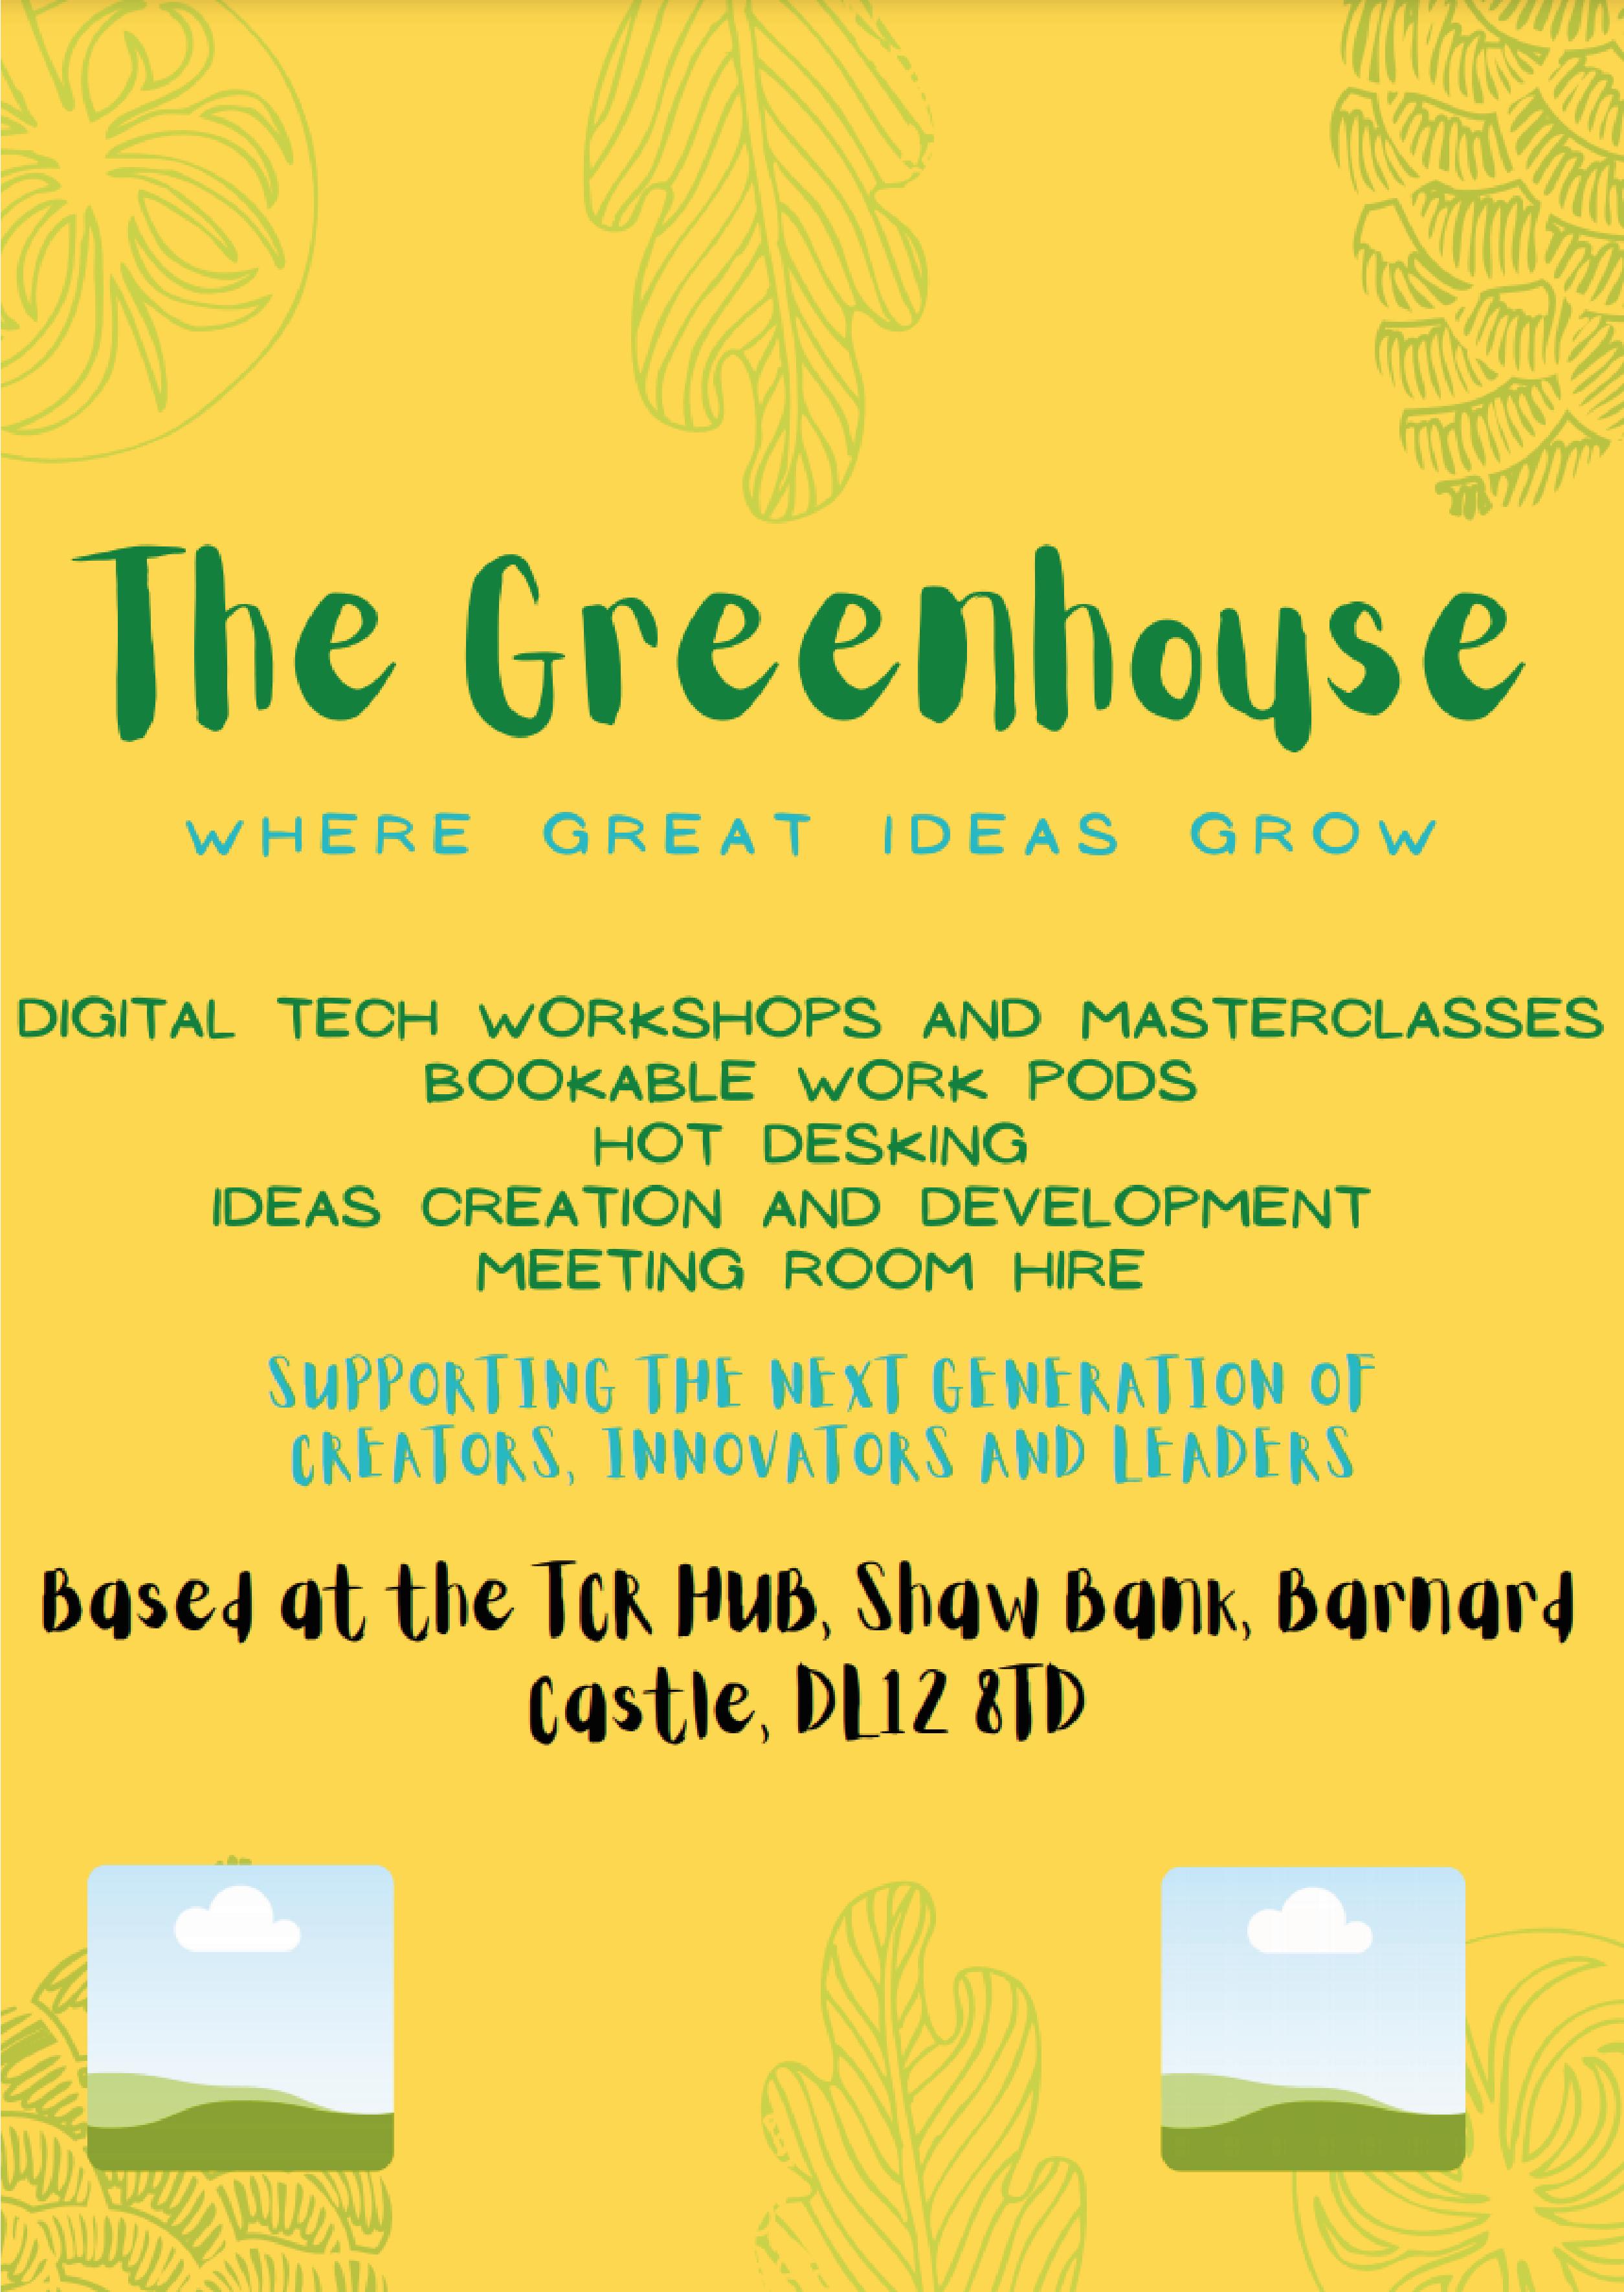 The Greenhouse TCR Hub